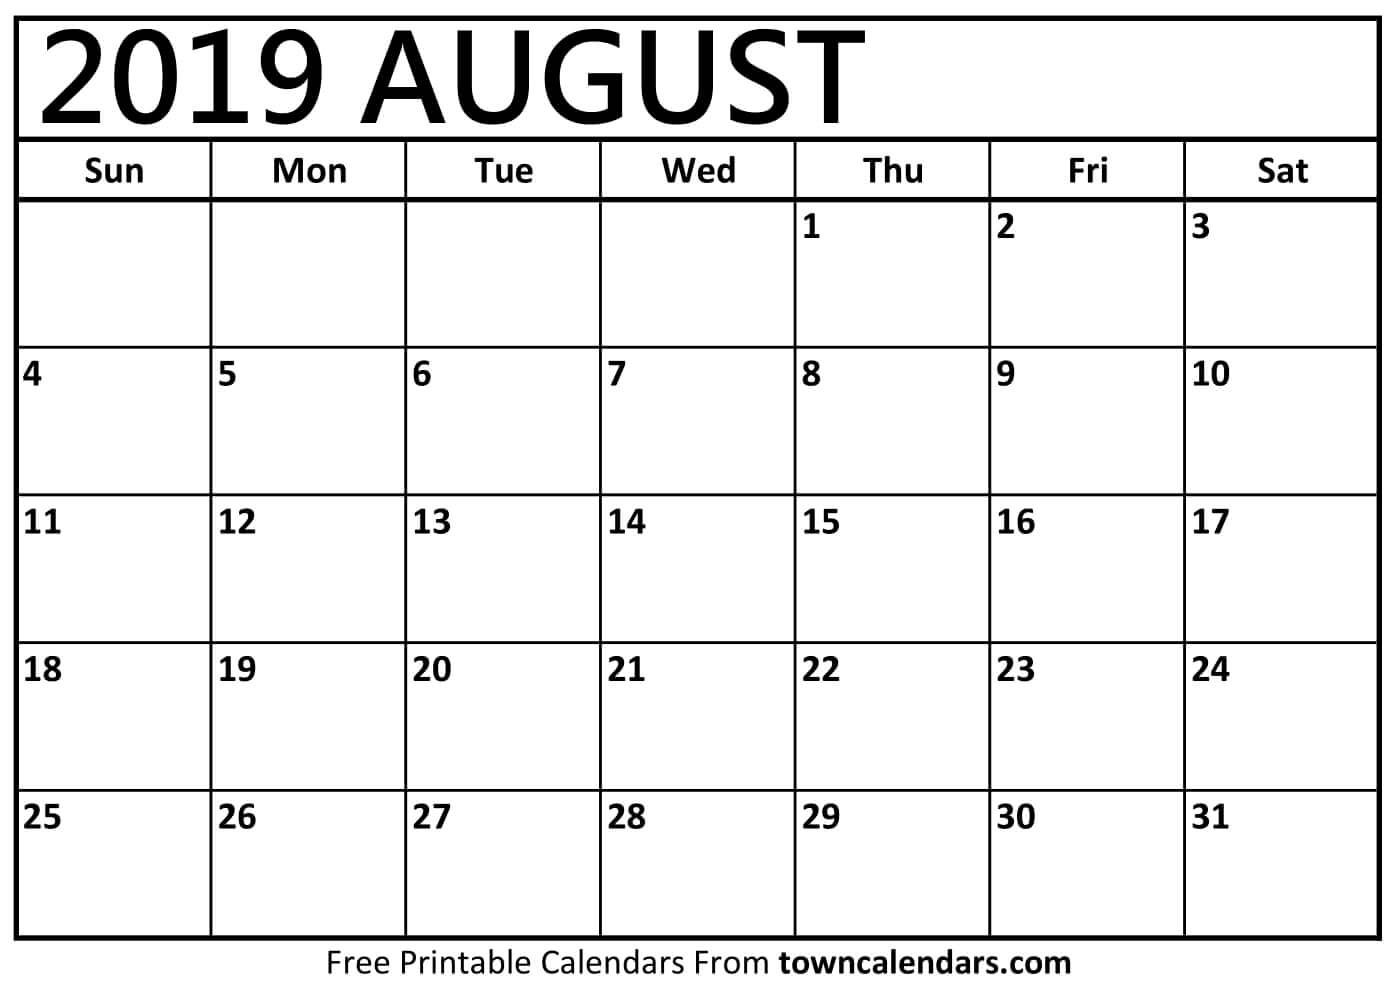 Printable August 2019 Calendar – Towncalendars August 3 2019 Calendar